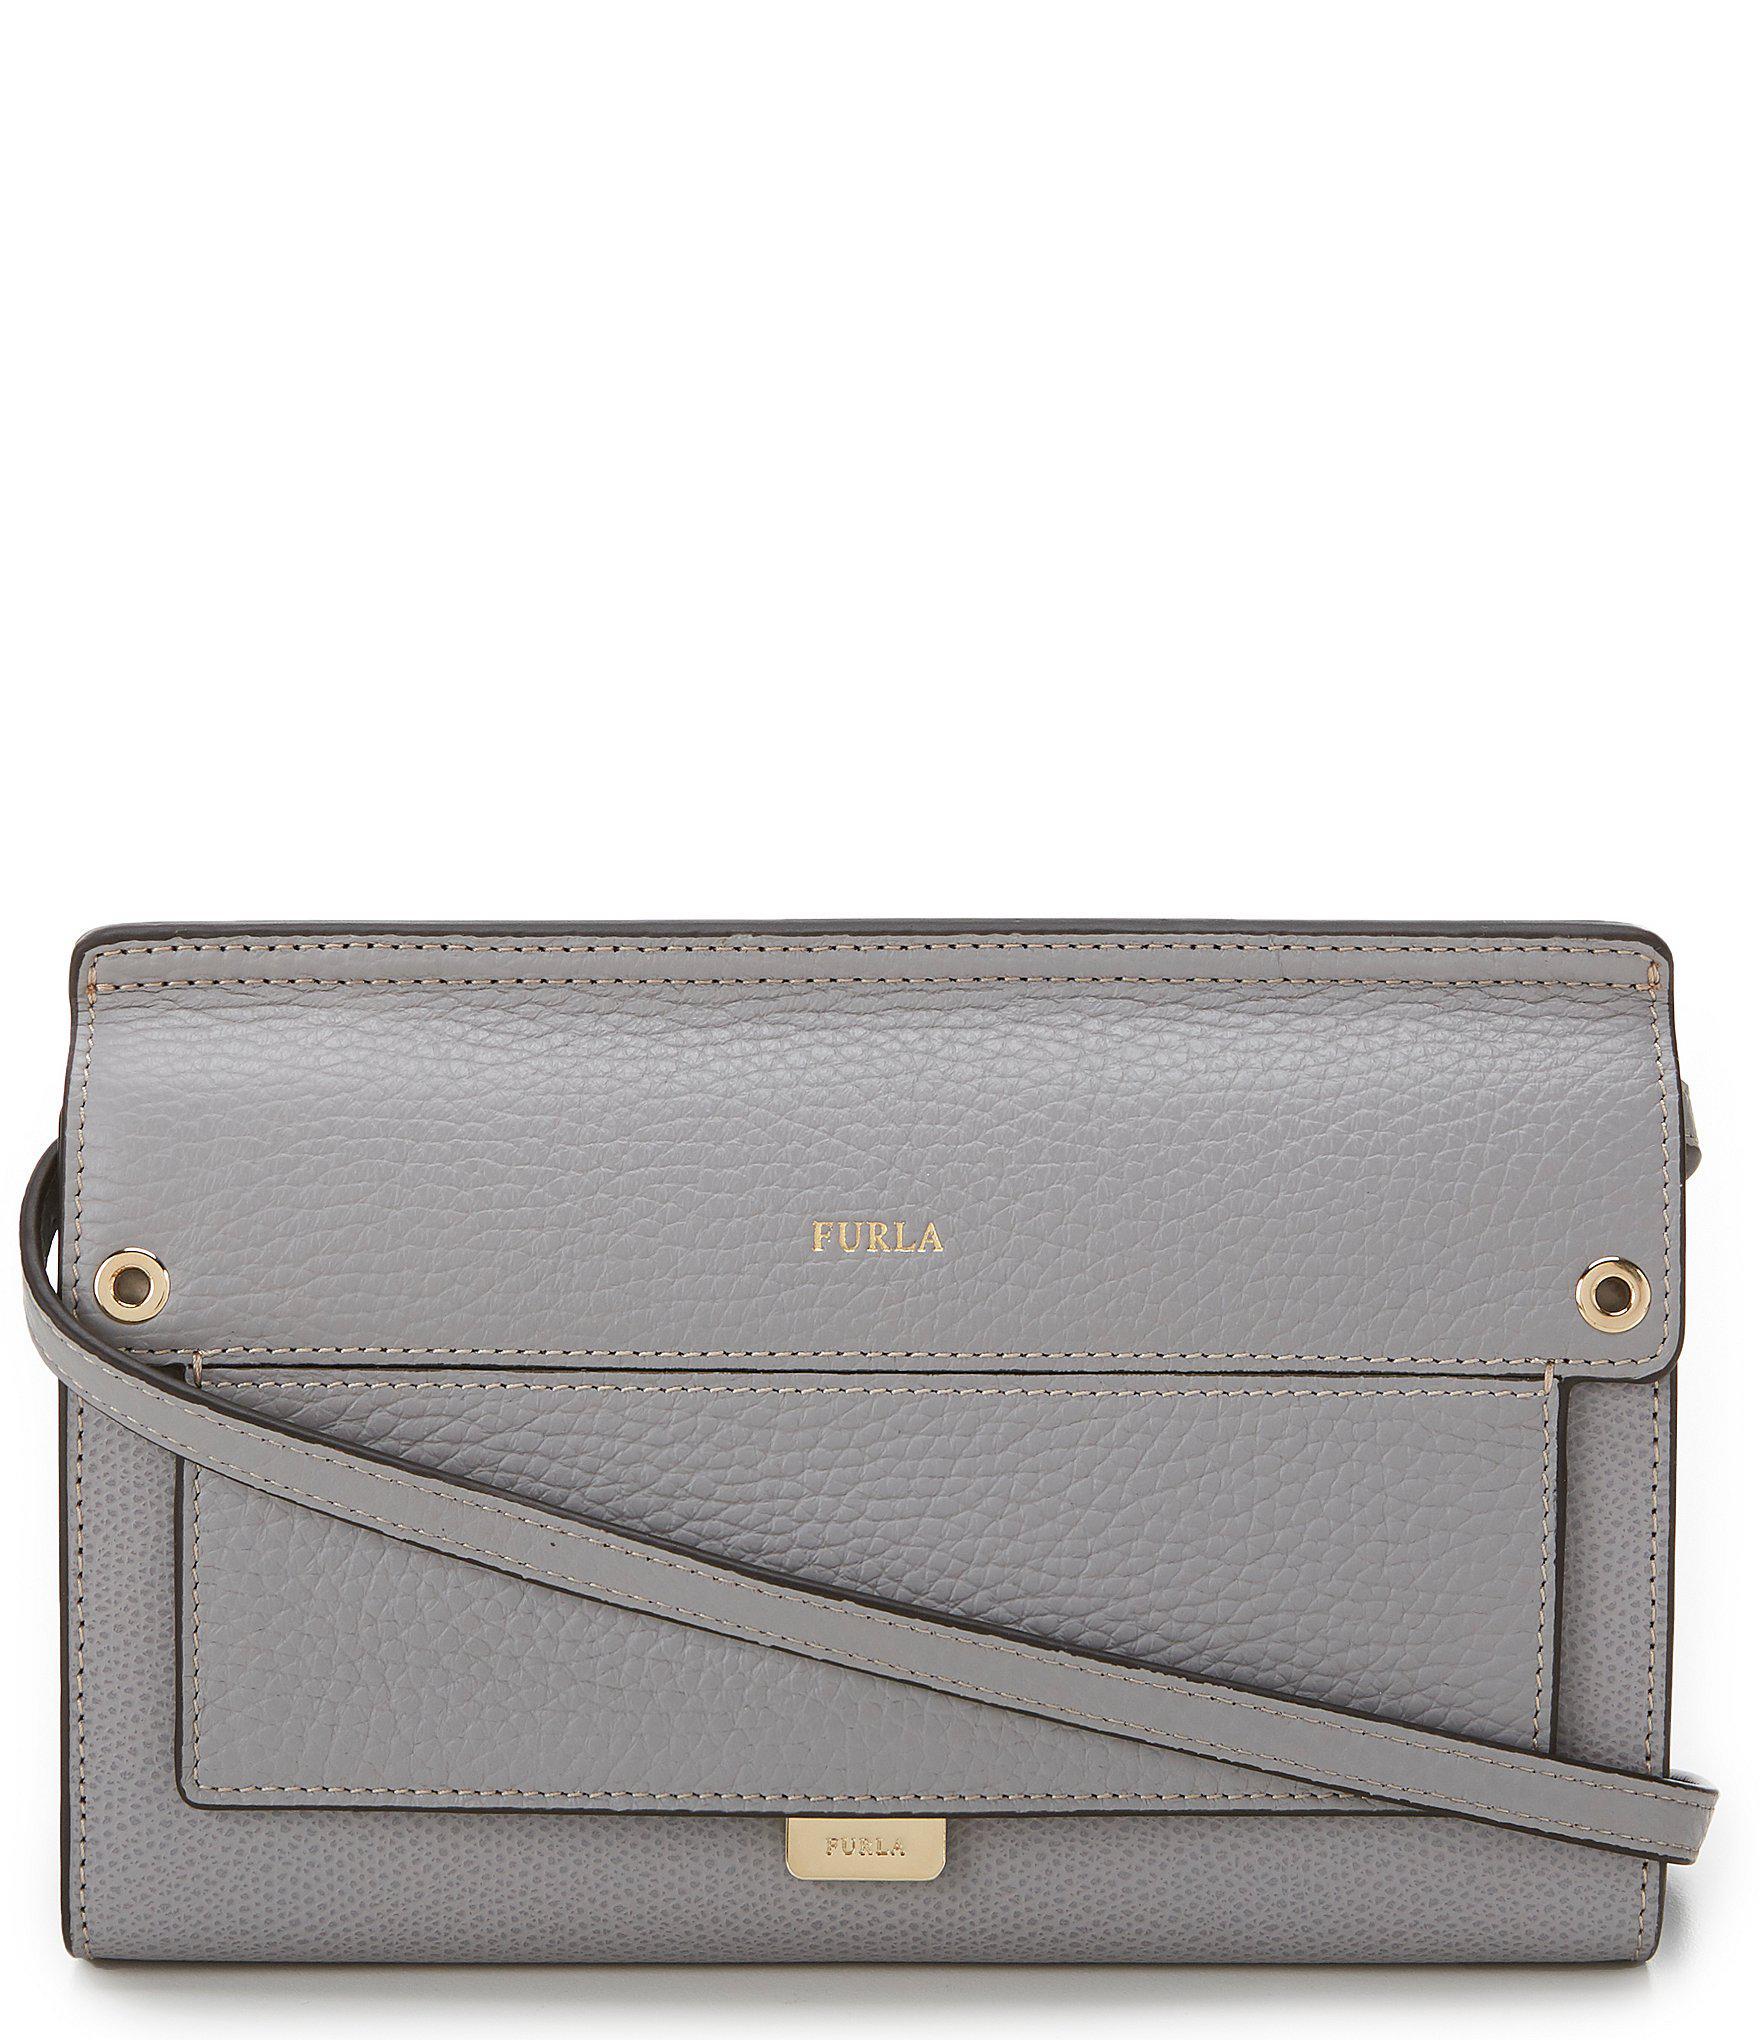 a175750fd13 Furla - Gray Like Mini Cross-body Bag - Lyst. View fullscreen